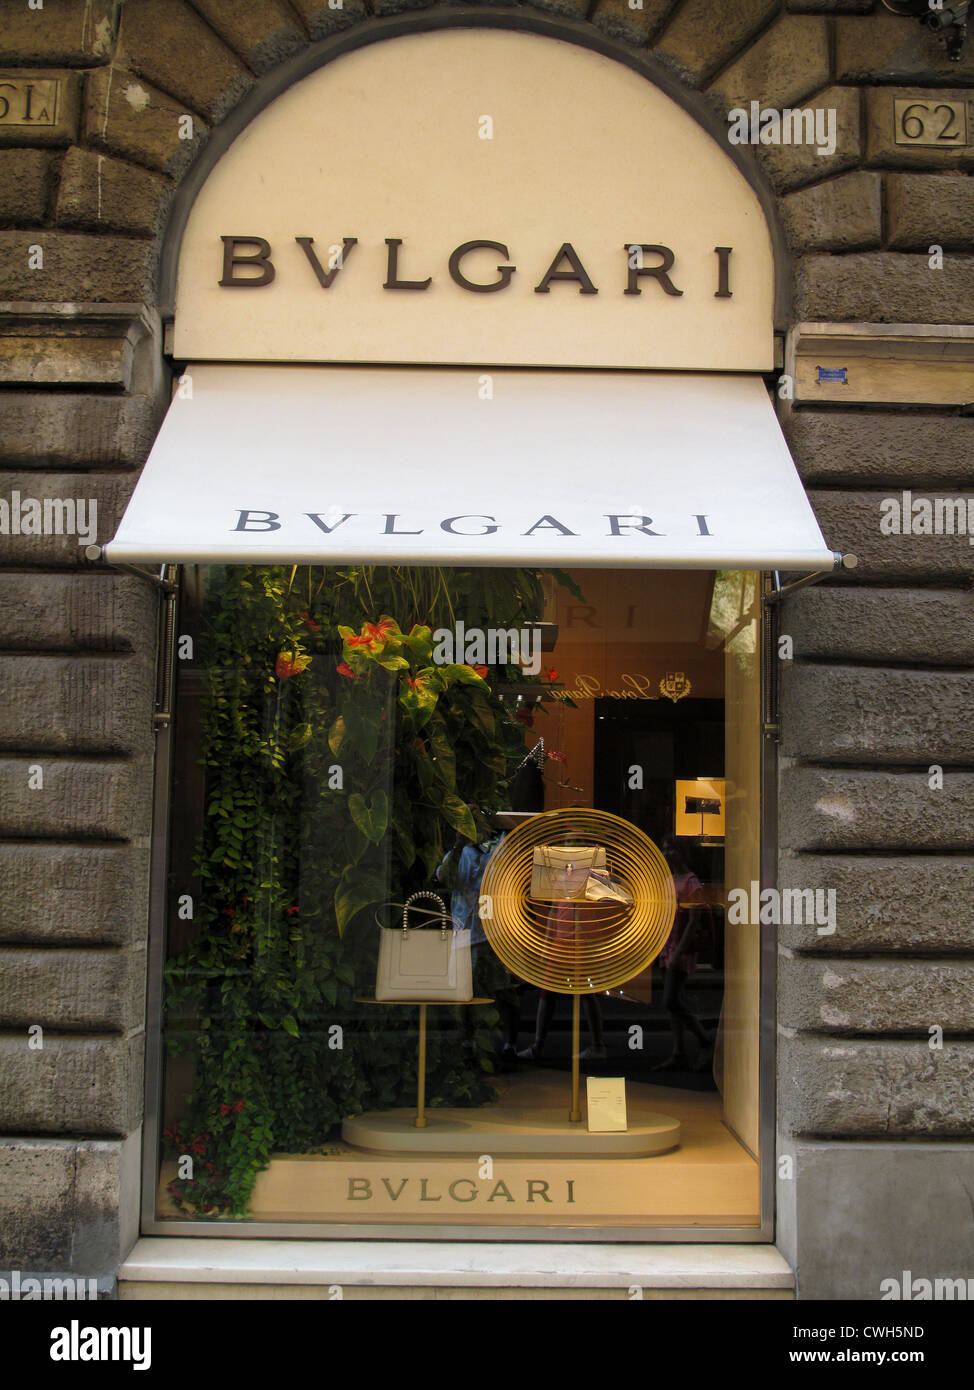 a1cdda30db6 Boutique Bulgari fenêtre dans le quartier branché de la rue Via Condotti à  Rome Italie Photo